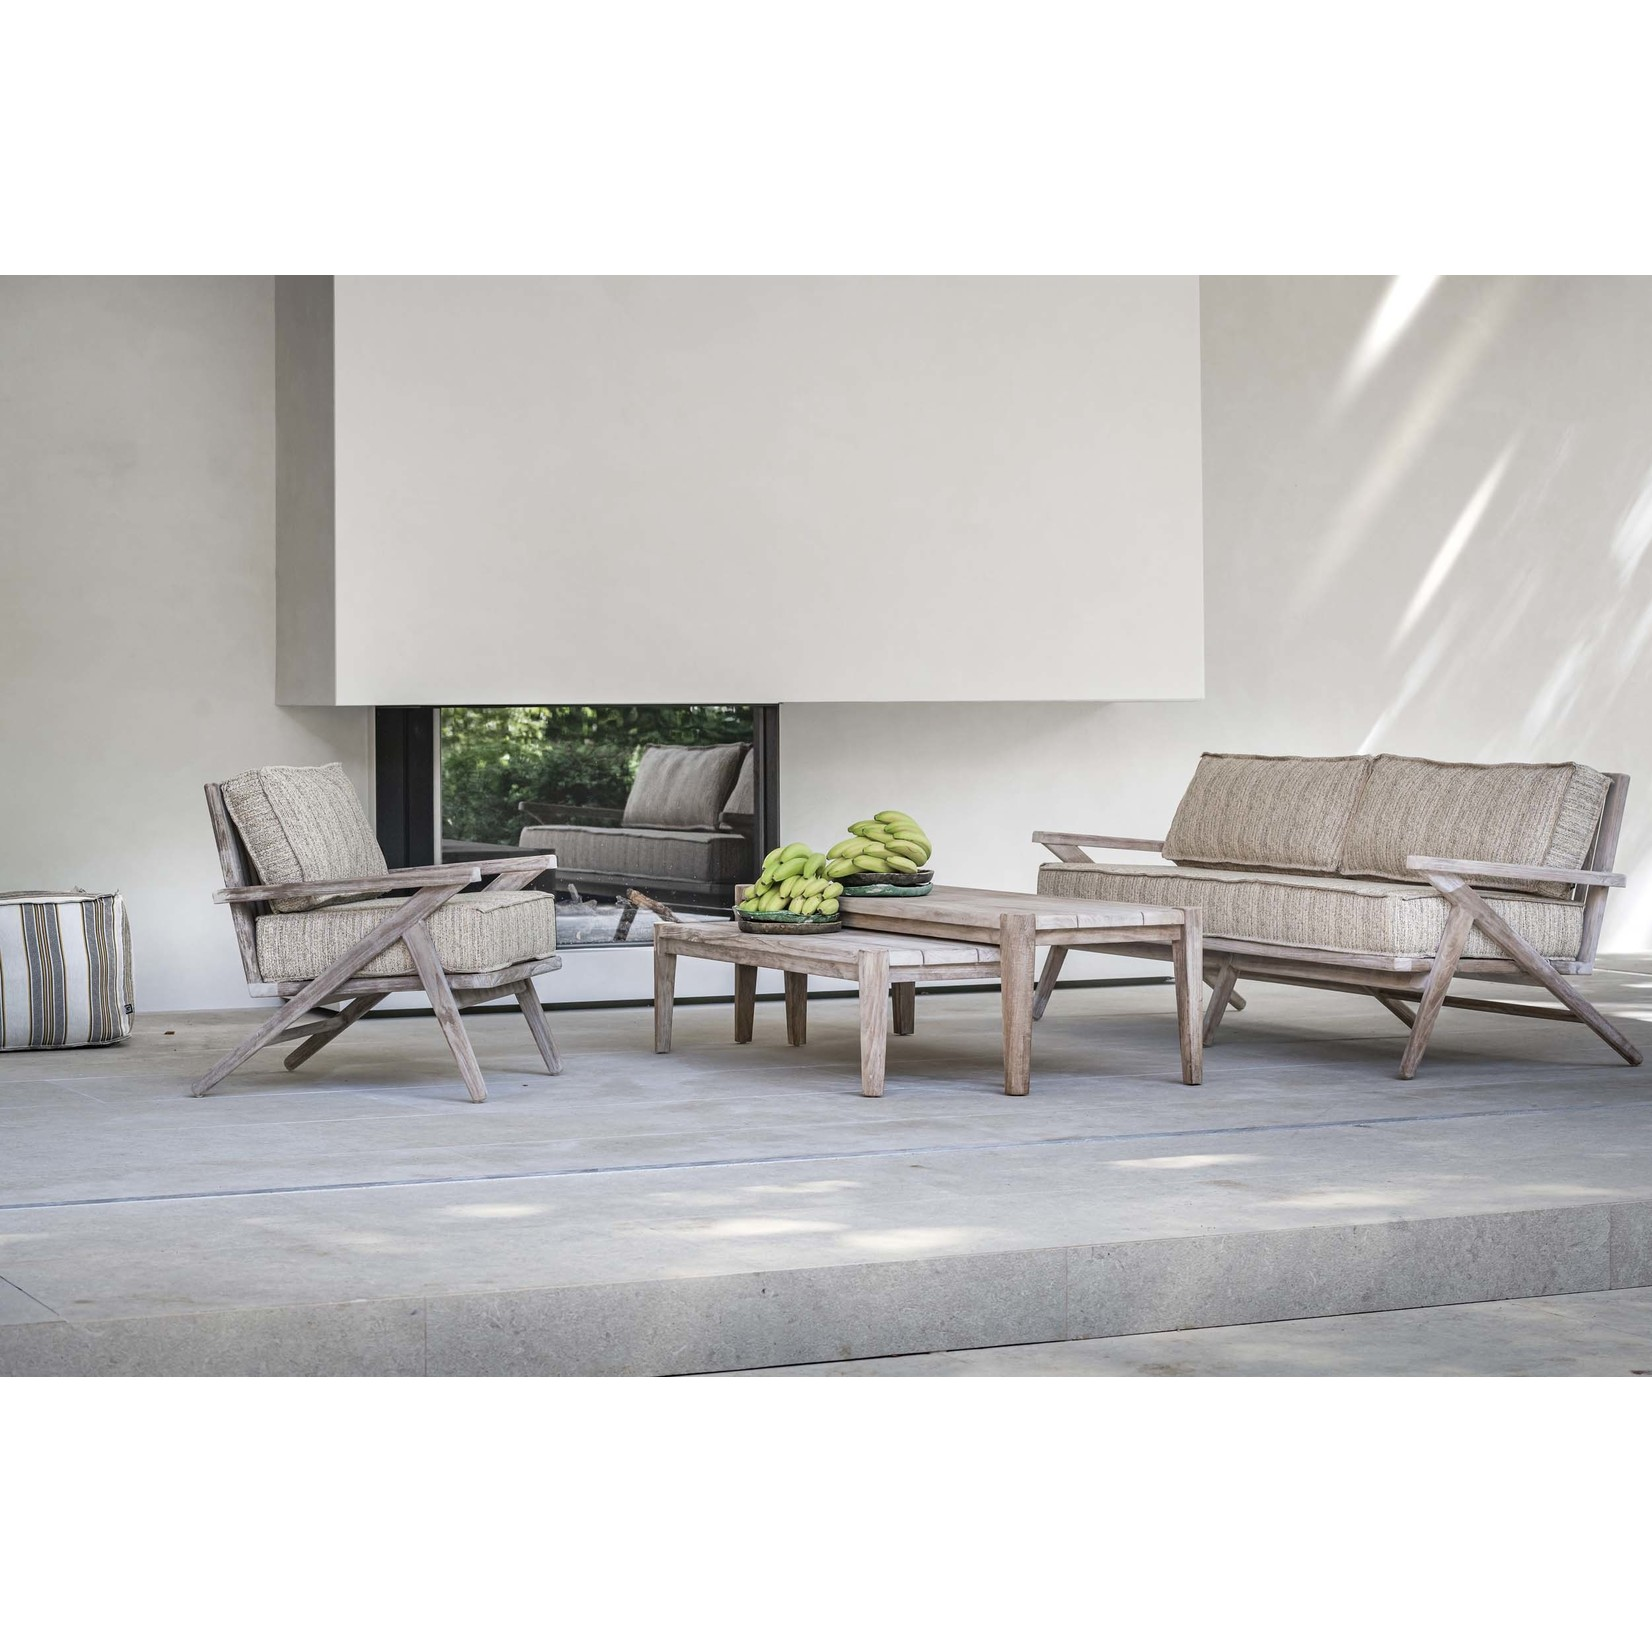 Gommaire 1-Seater Alabama | Teak Natural Grey + Cushion